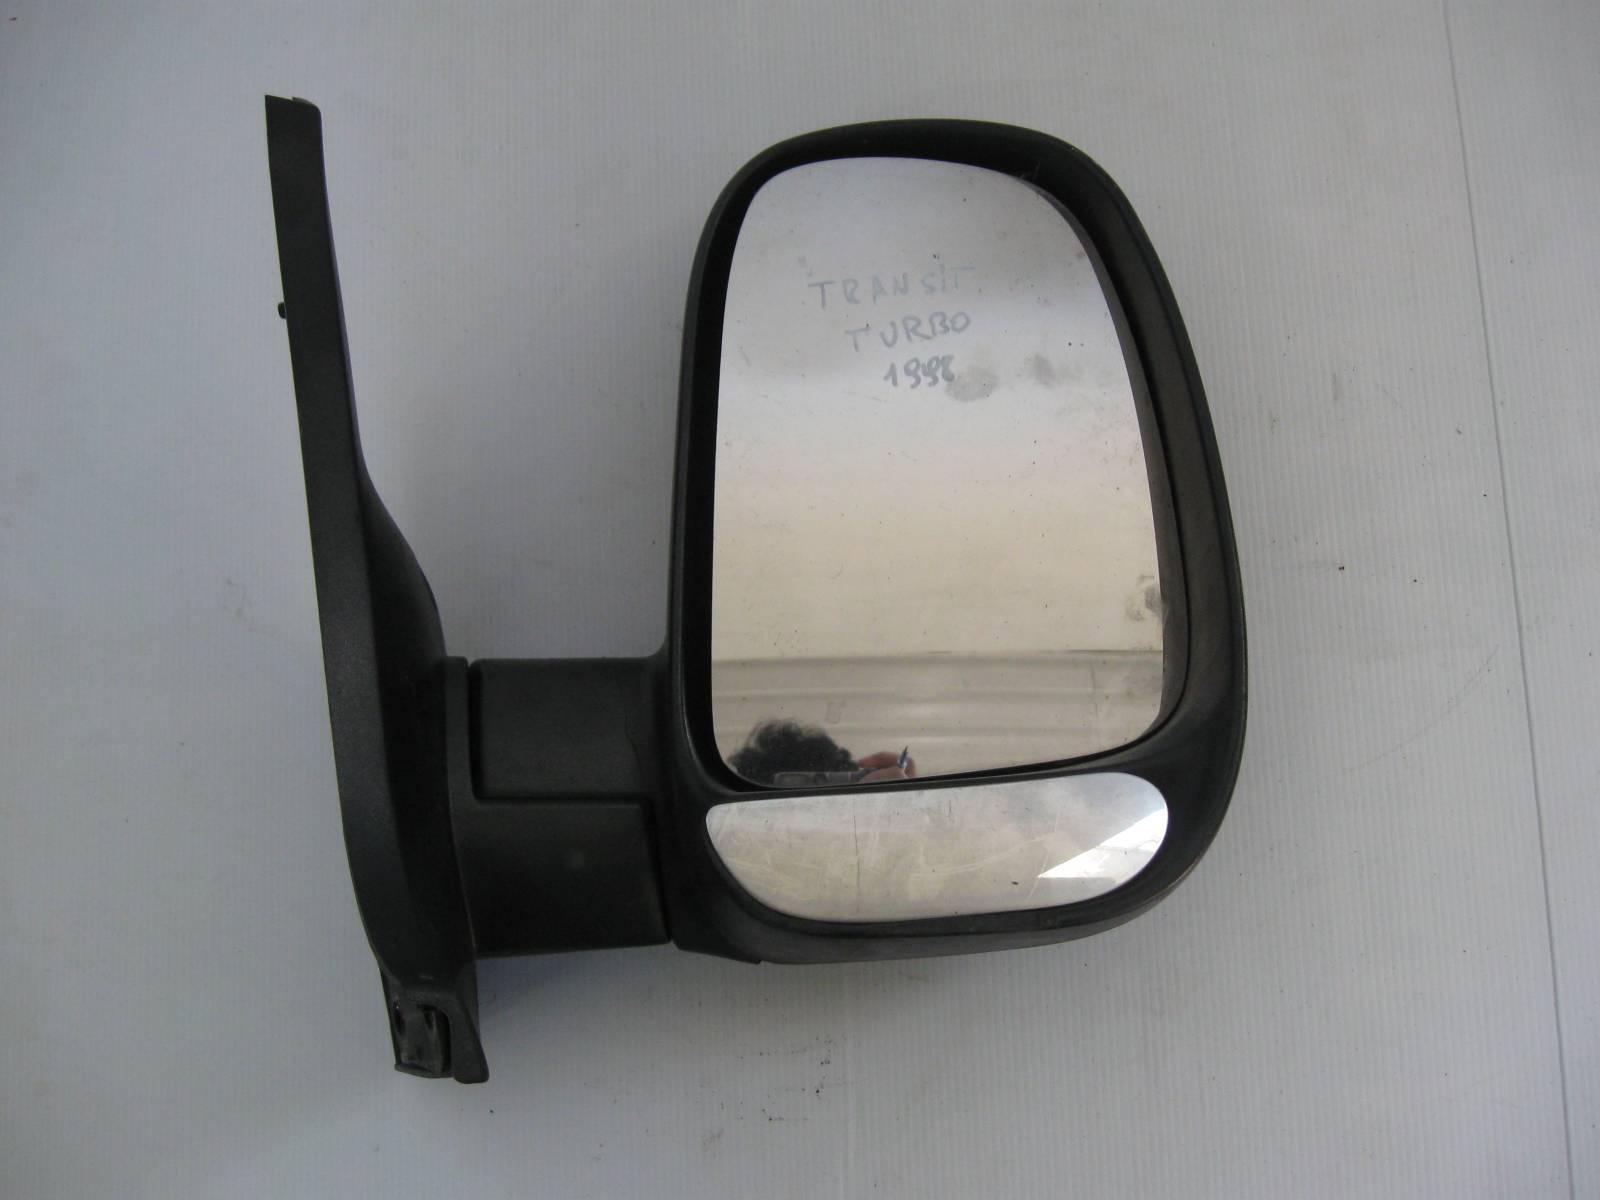 Правое зеркало на форд транзит 6 фотография